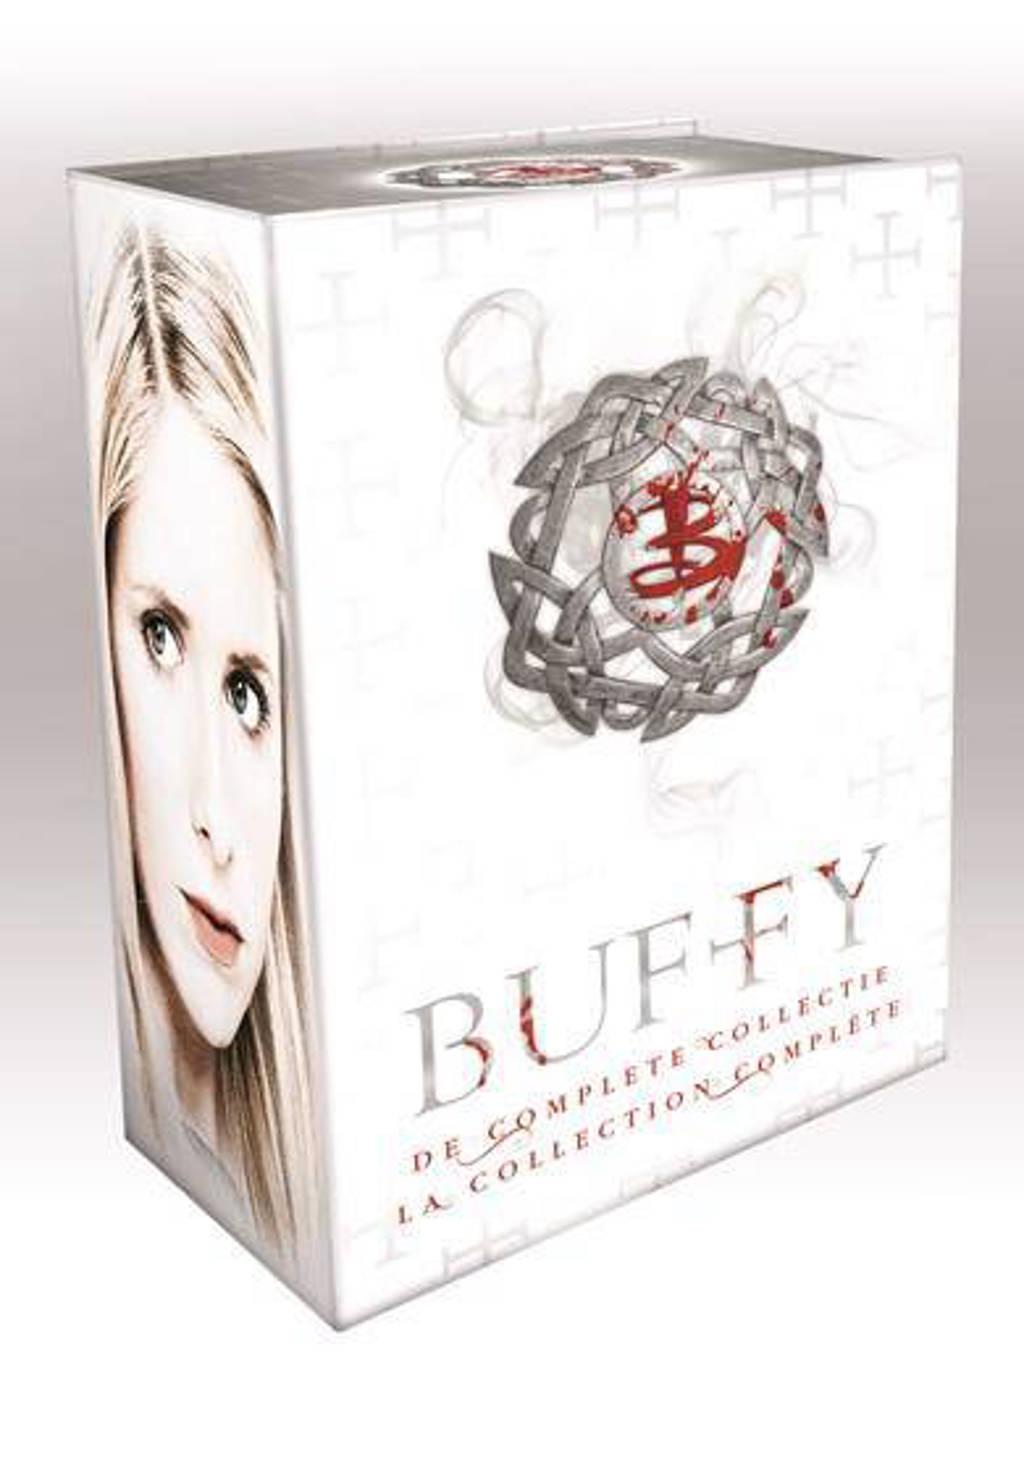 Buffy the vampire slayer - De complete collectie (DVD)